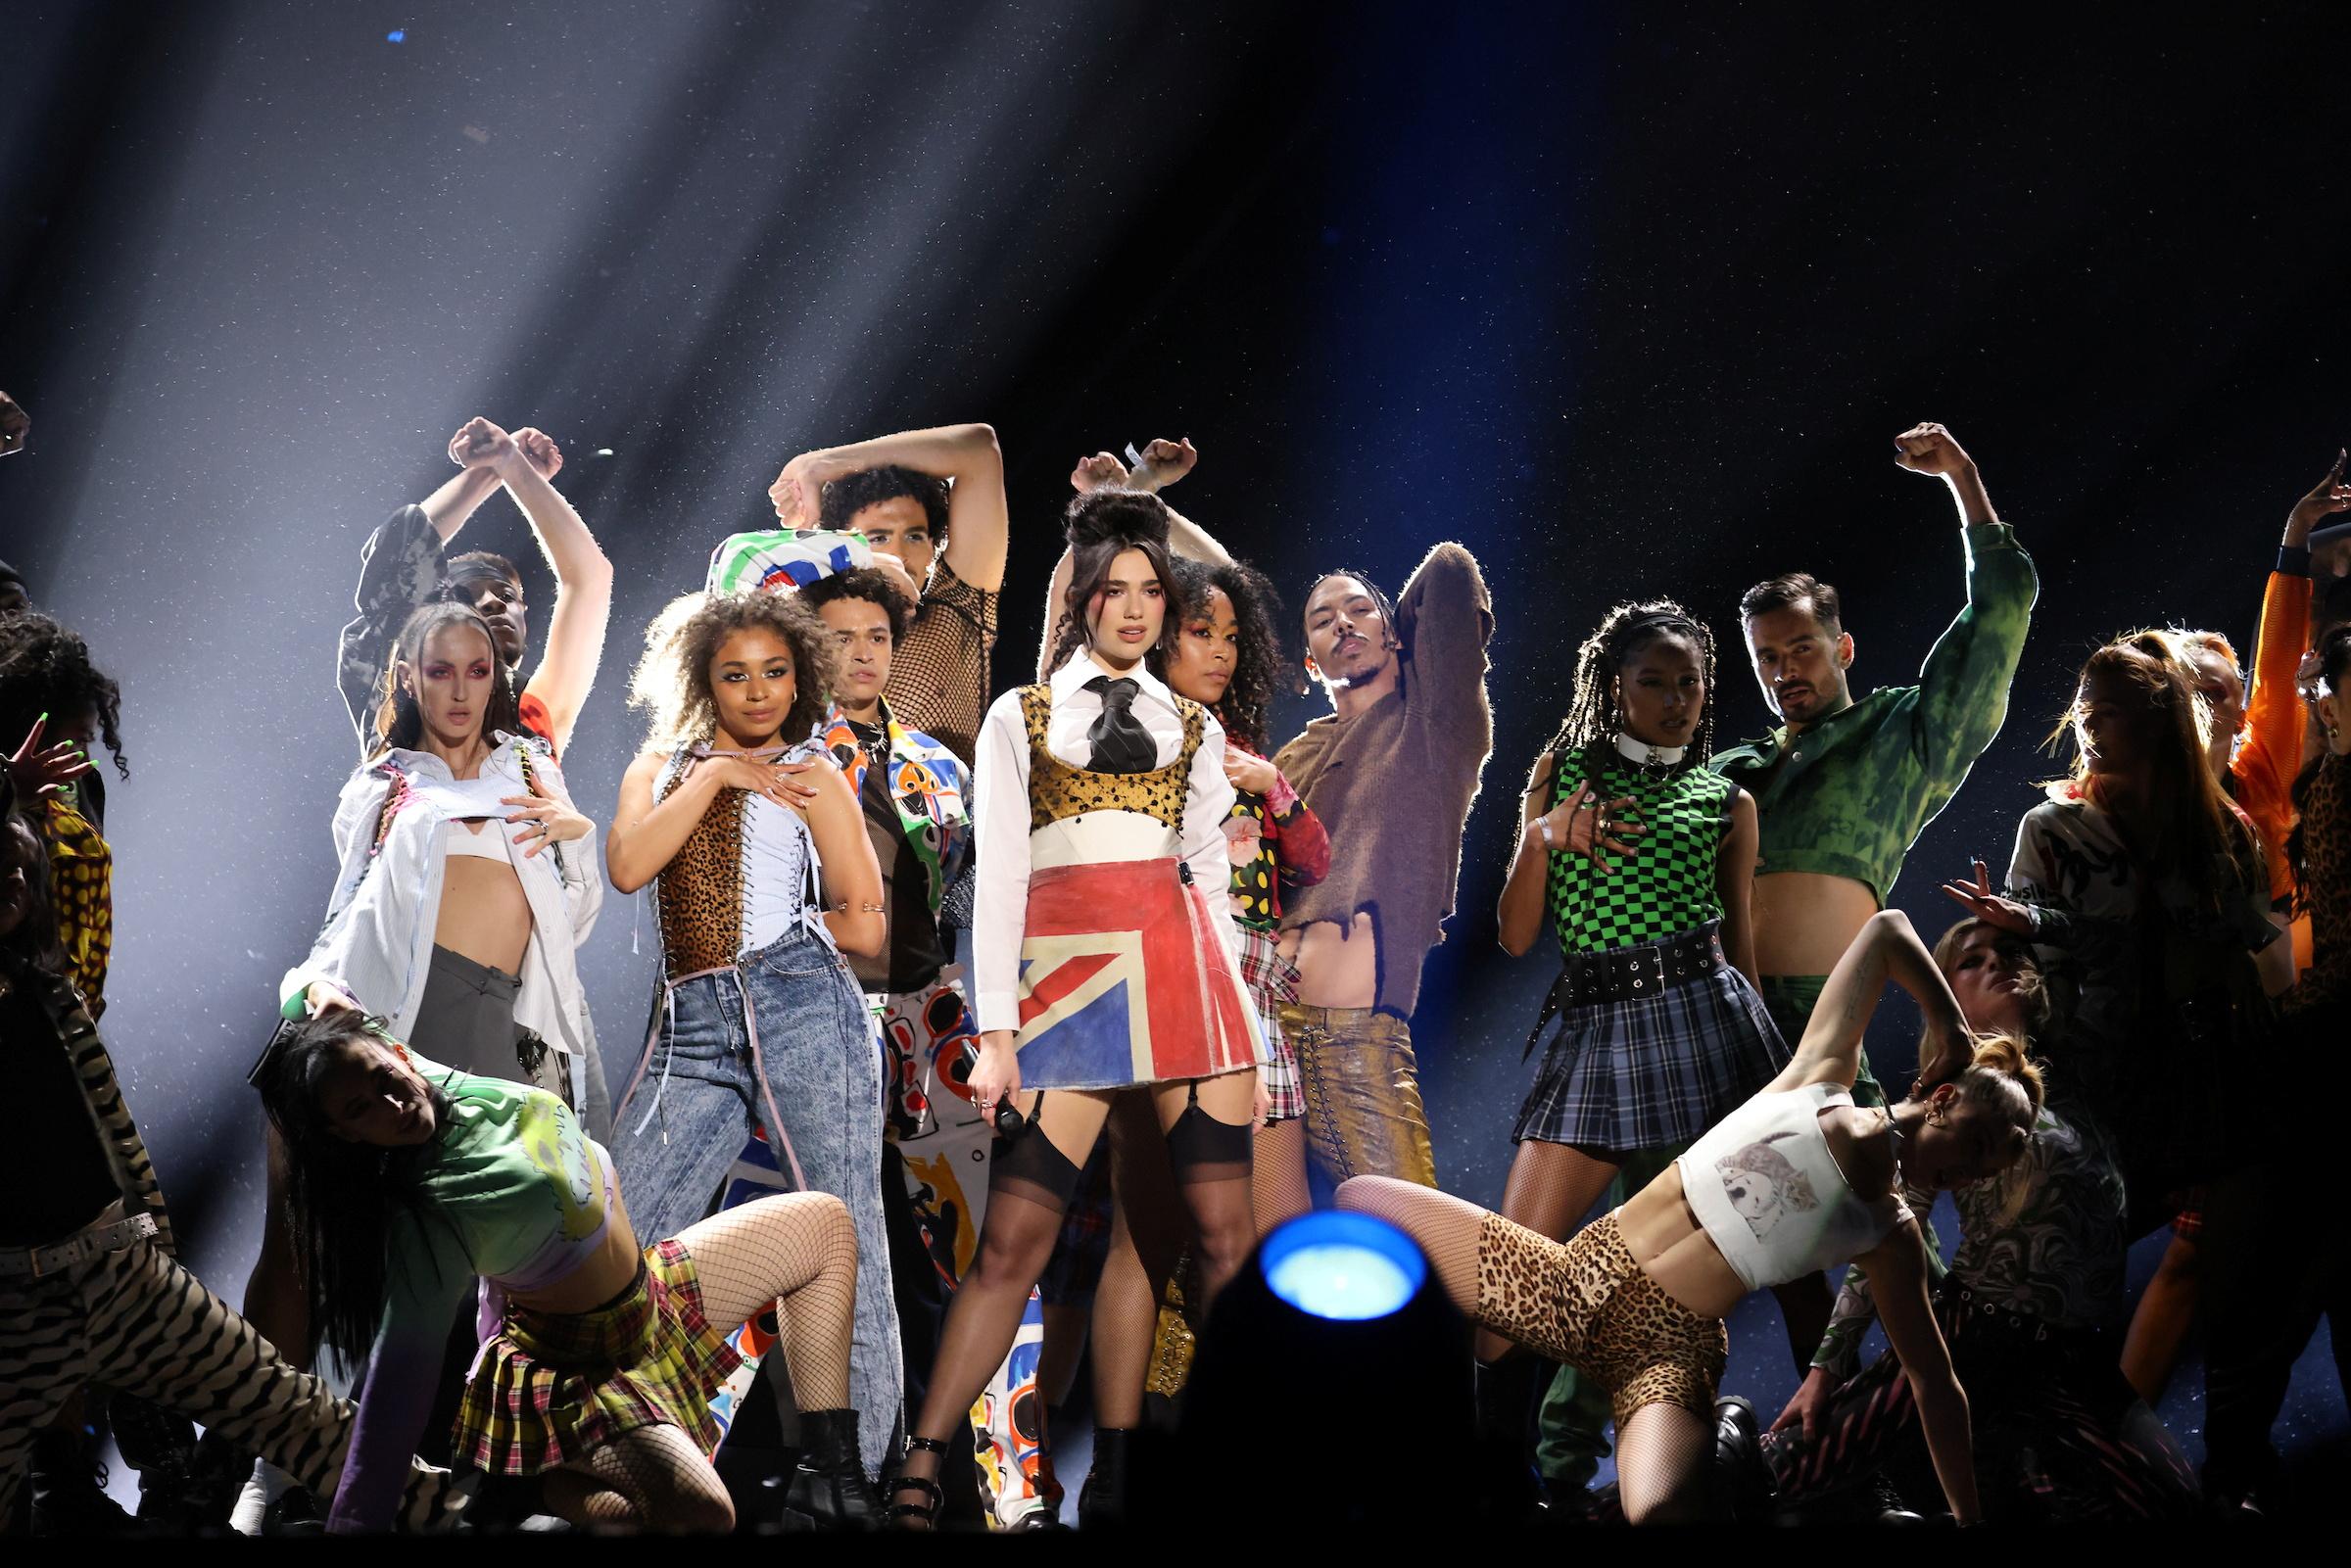 BRIT Awards 2021: Οι μεγάλοι νικητές και οι εμφανίσεις που «έκλεψαν» τις εντυπώσεις (pics, vids)